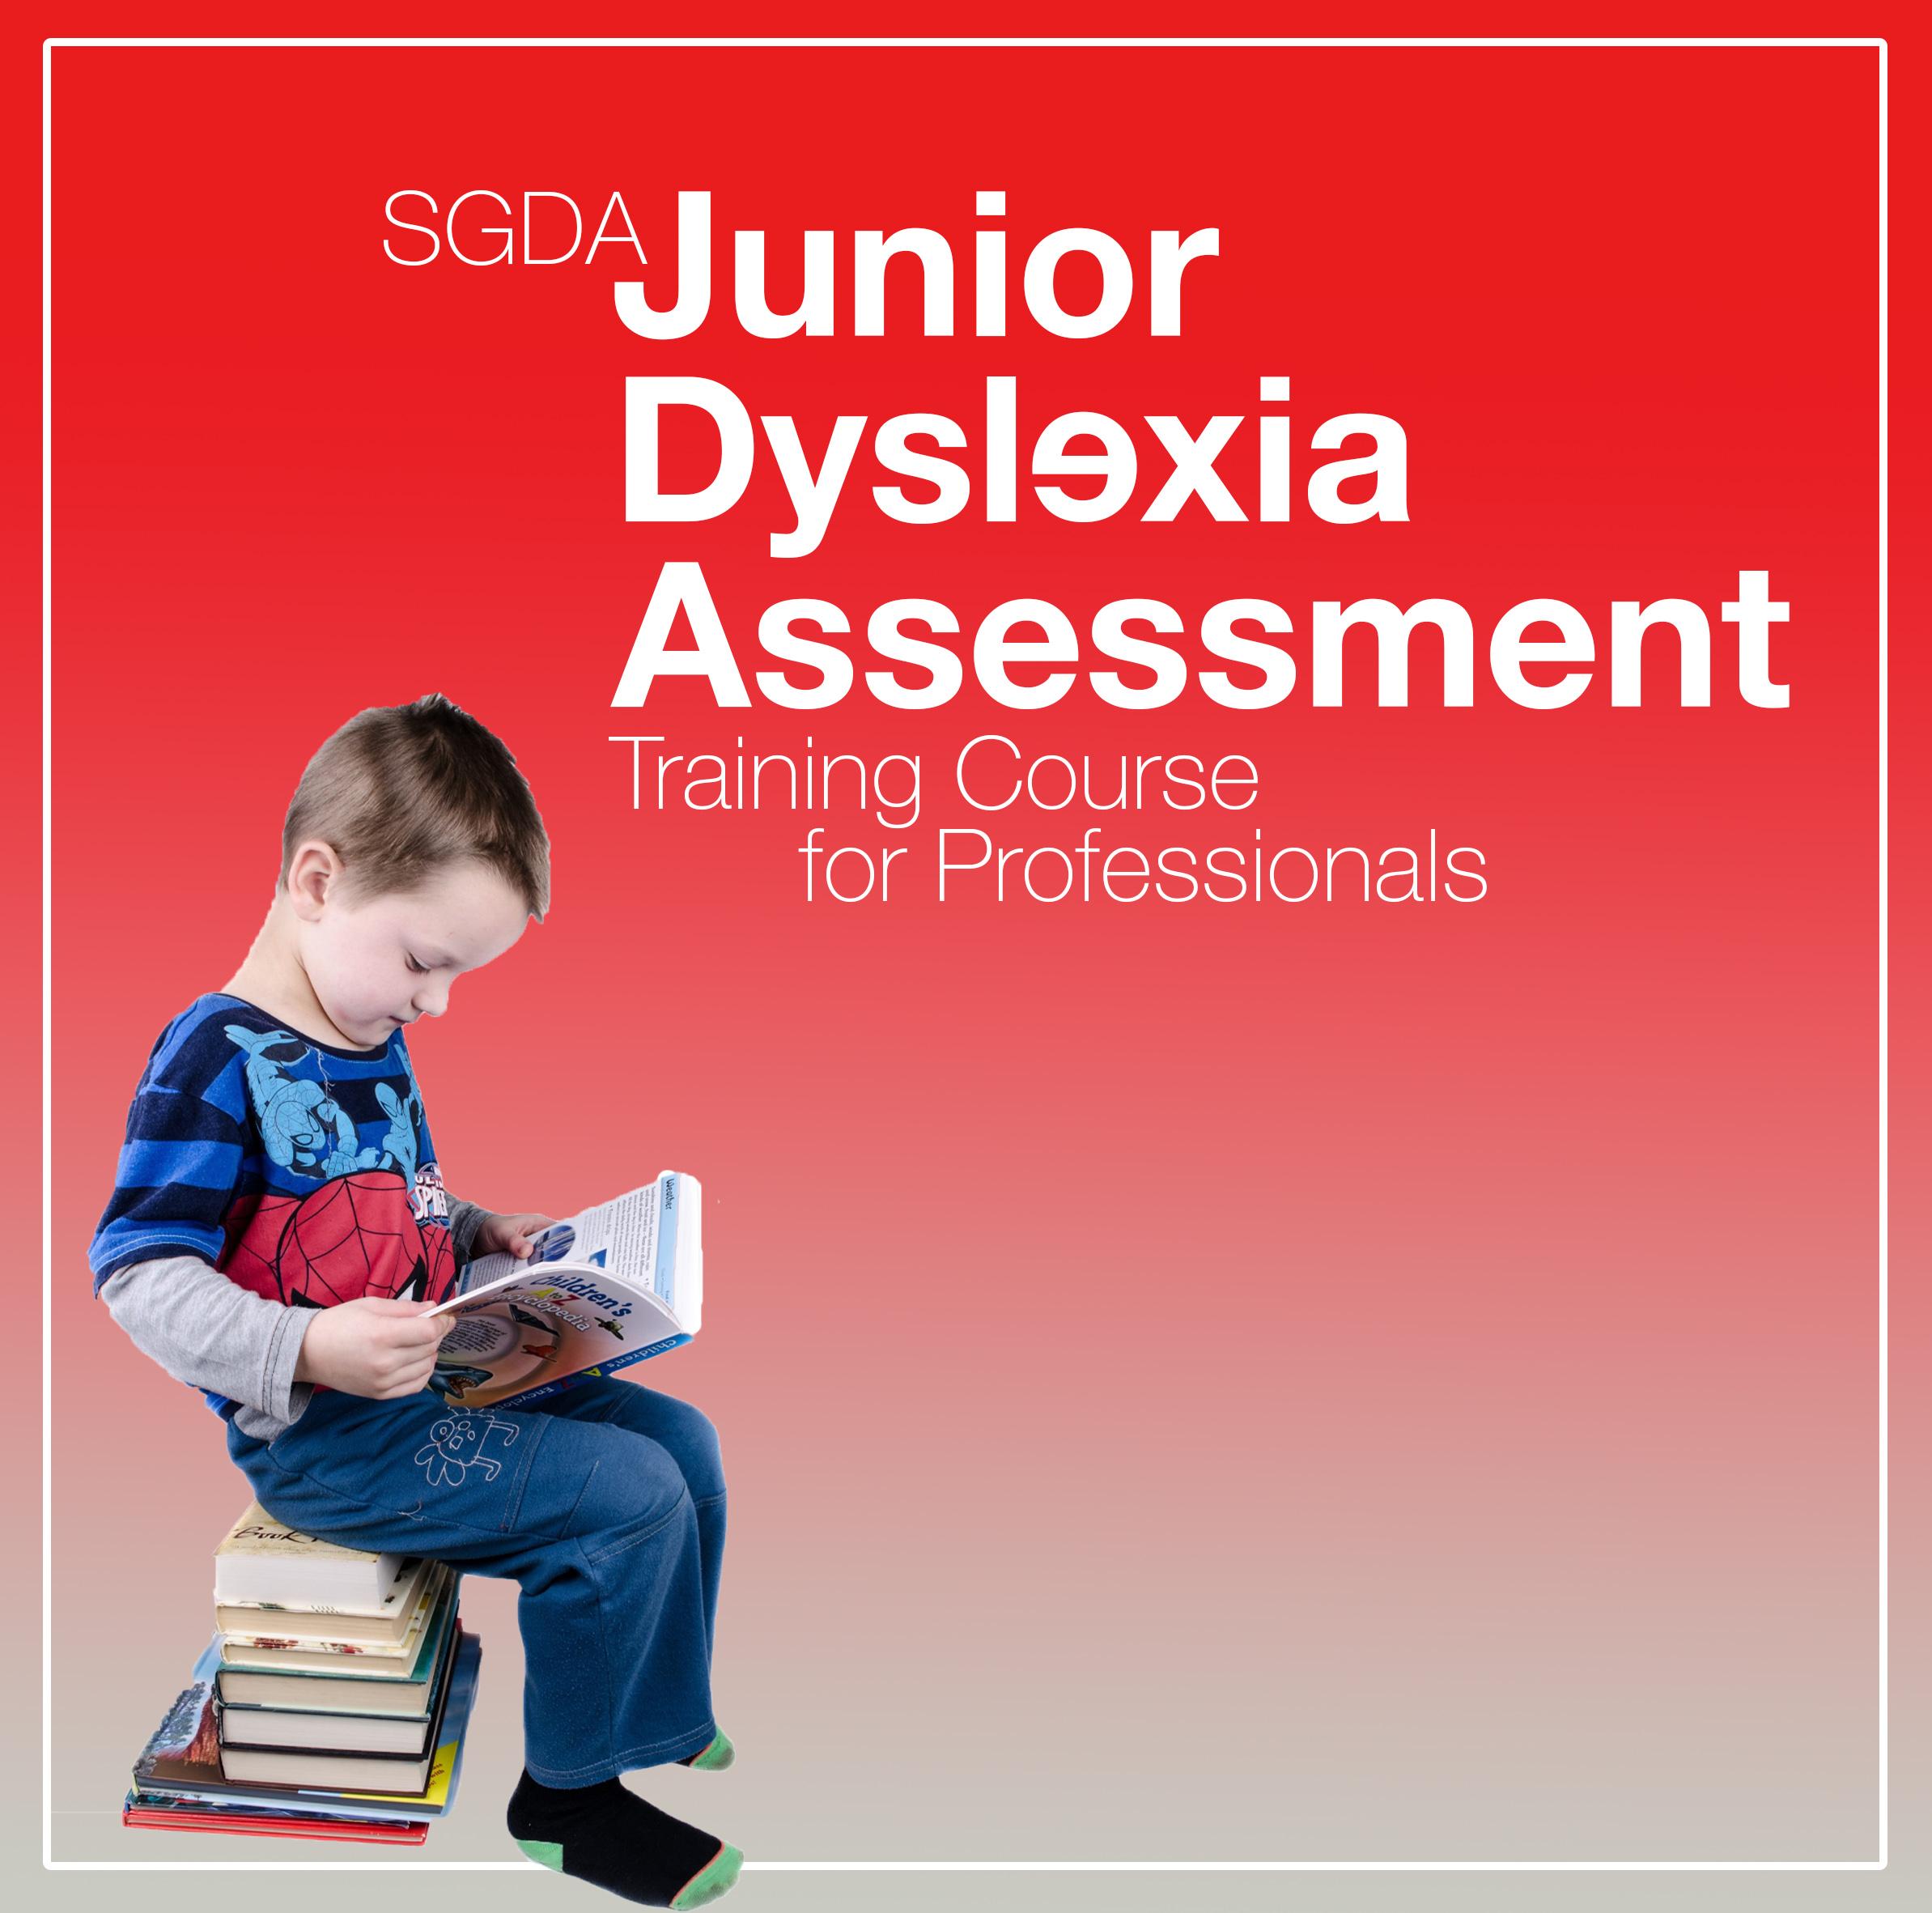 JuniorDyslexia